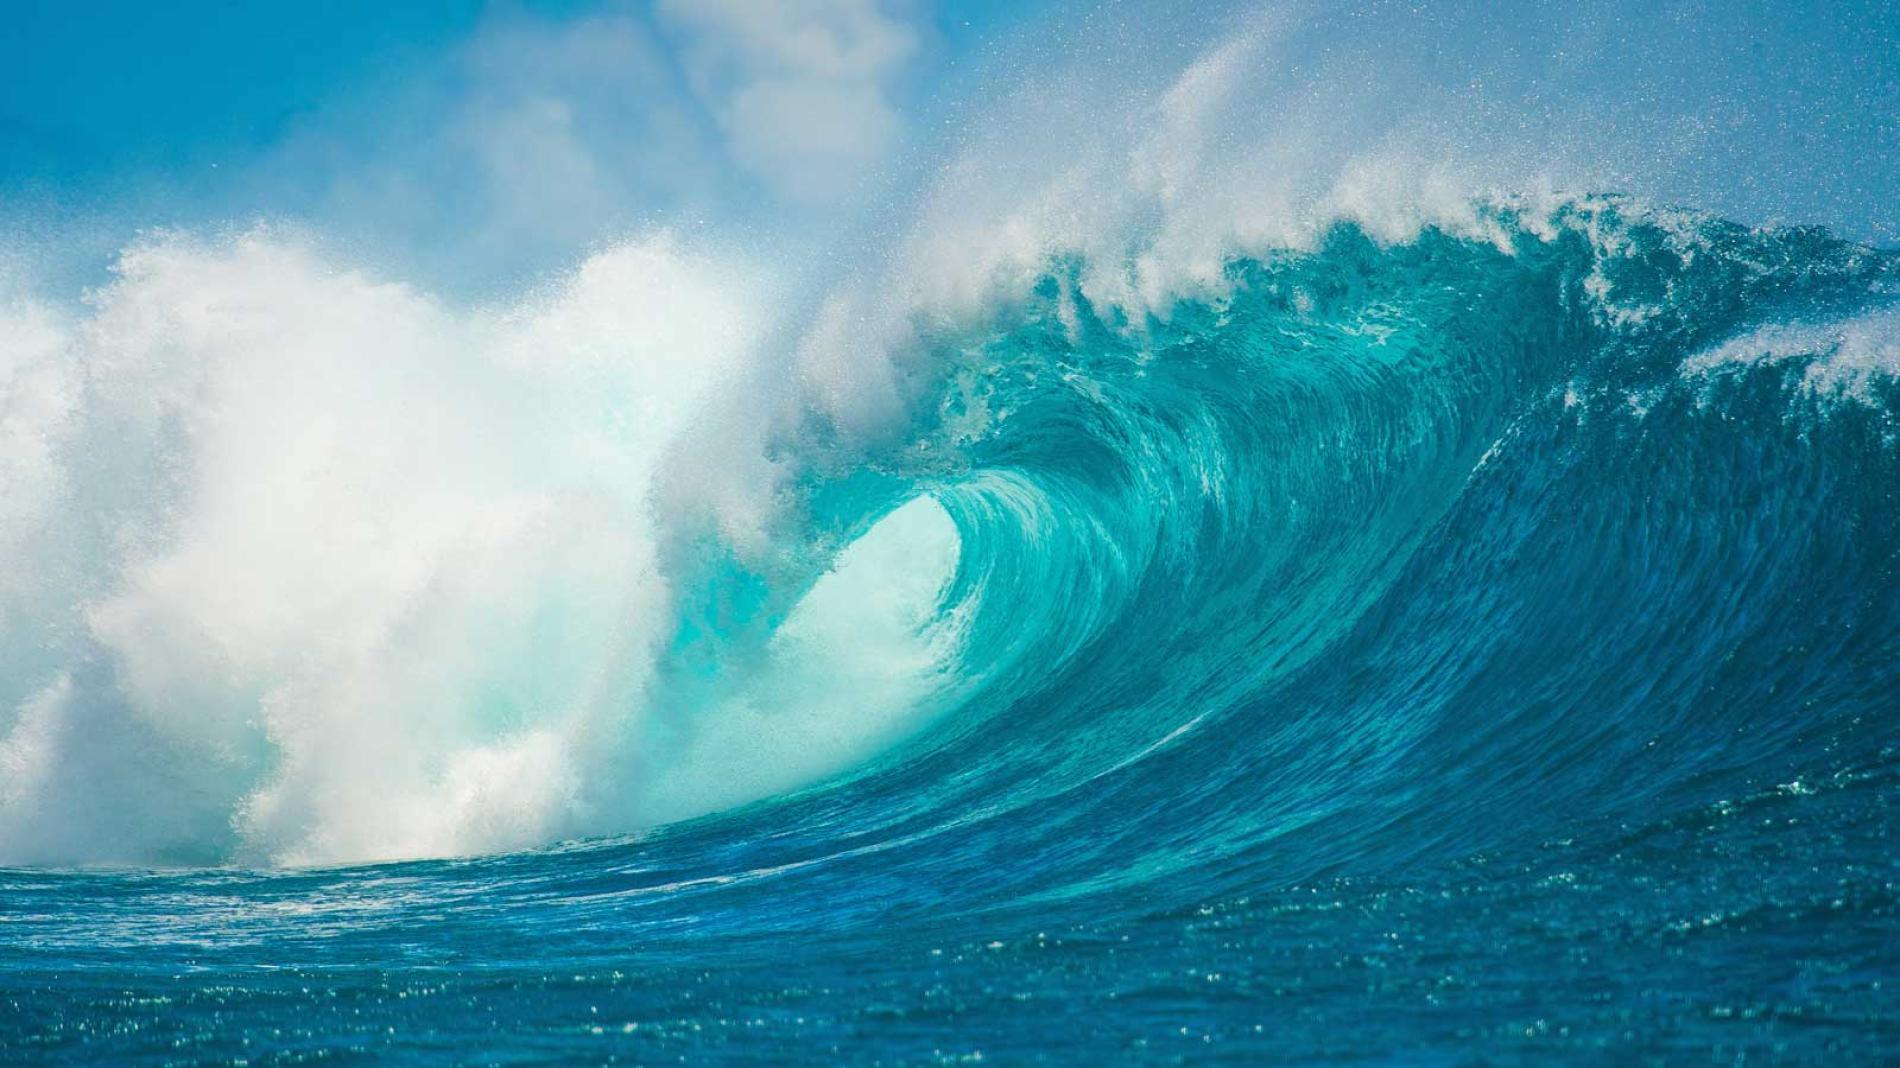 Ocean photo